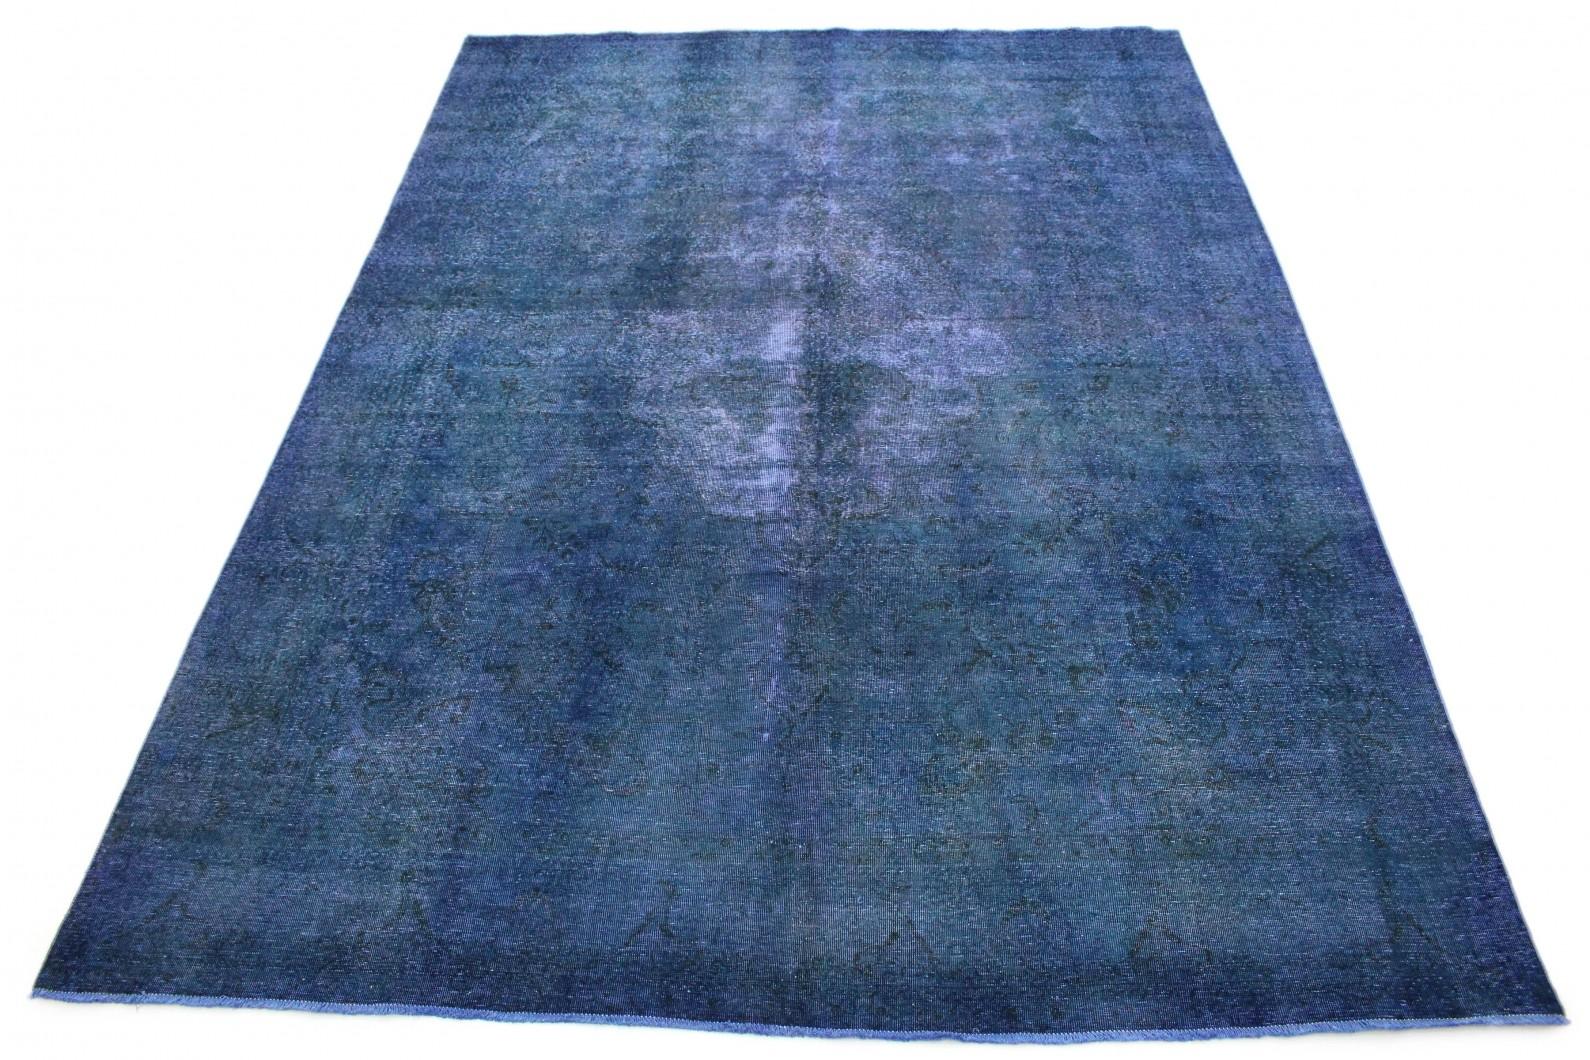 Vintage Teppich Blau in 400x290 (1 / 6)